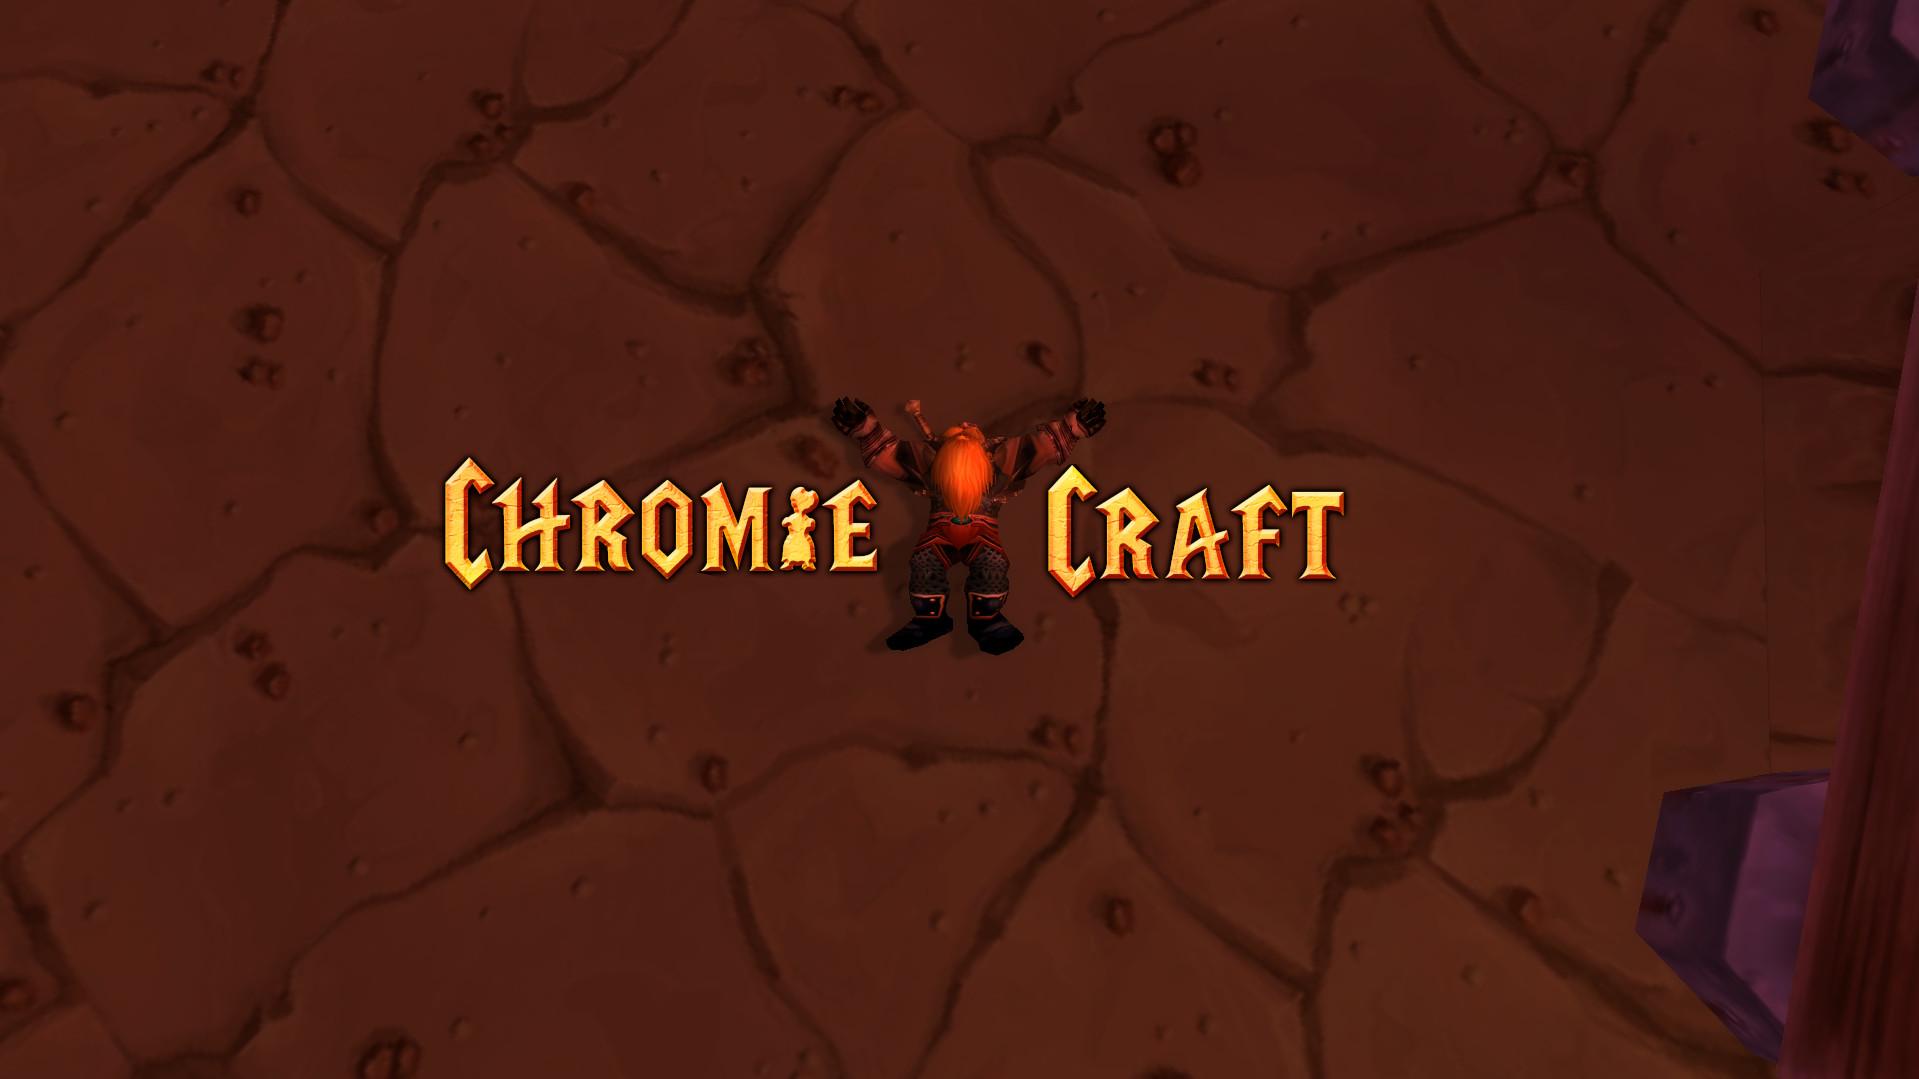 ChoromieCraft artwork by mictlanfan